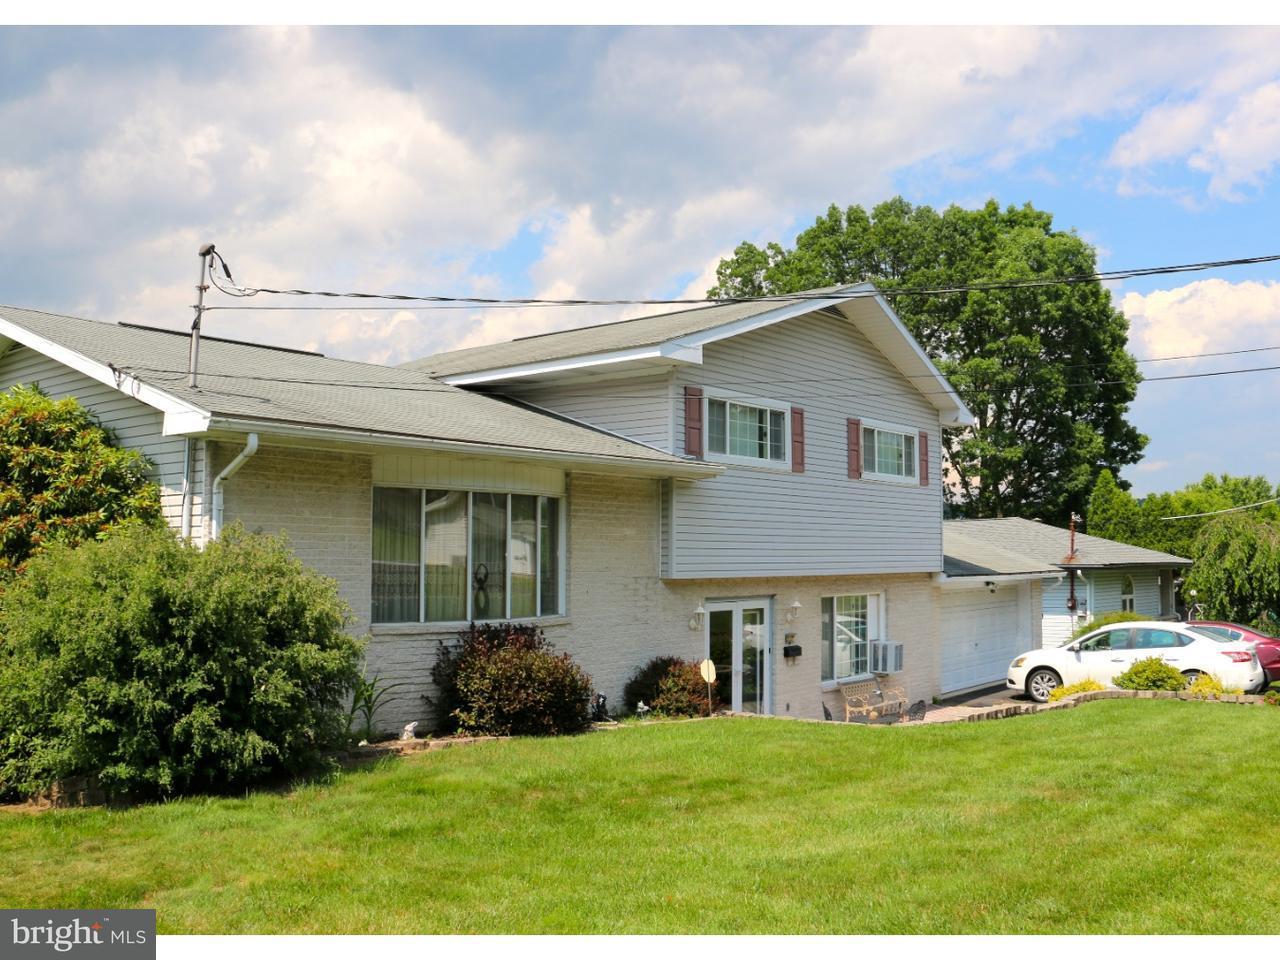 Single Family Home for Sale at 517 W NICHOLAS Street Frackville, Pennsylvania 17931 United States